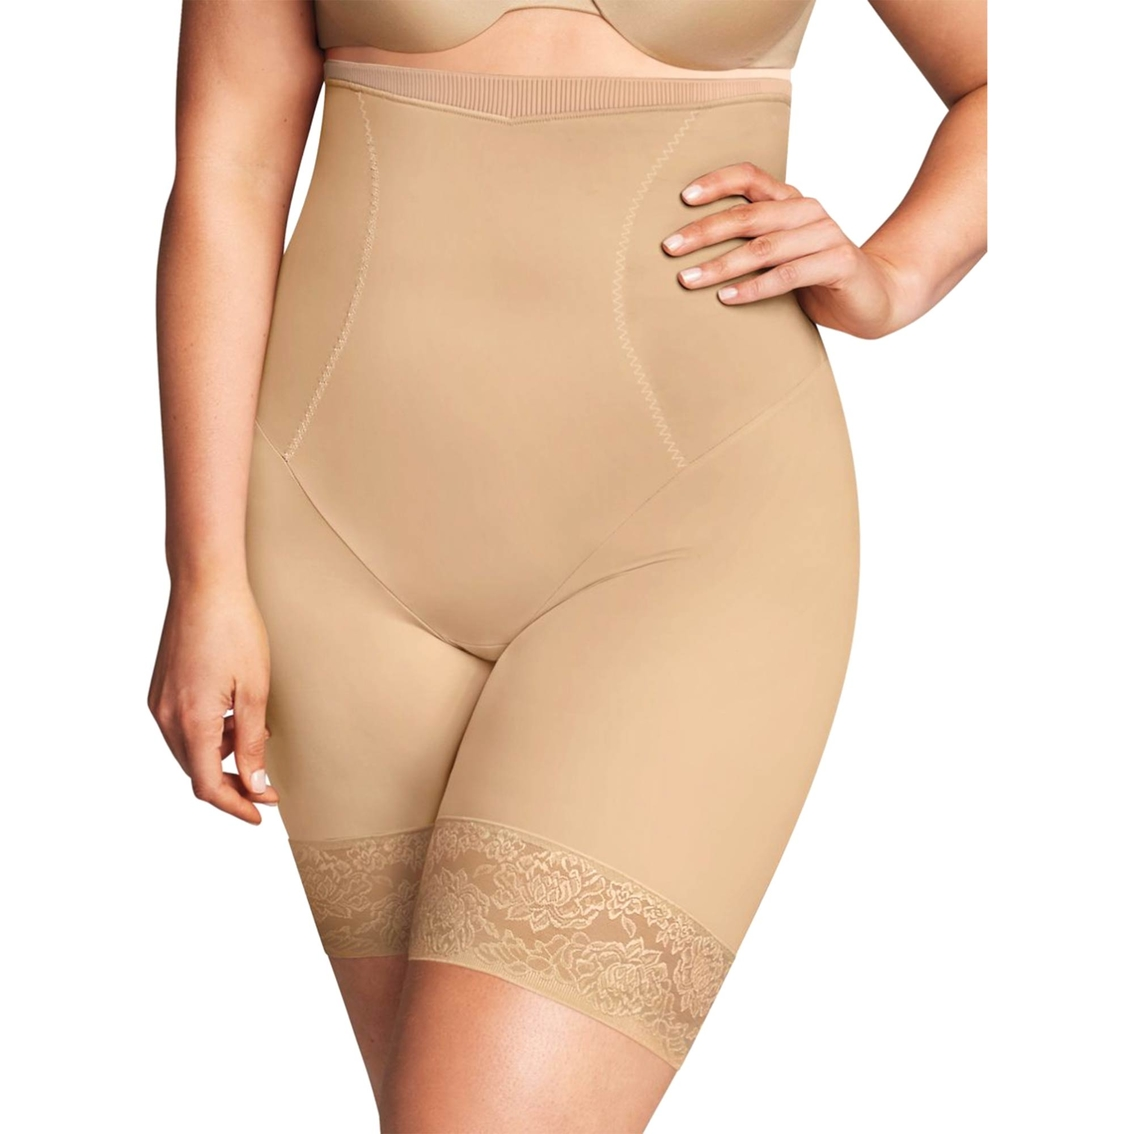 7d3202153a8 Maidenform Shapewear Curvy Firm High-waist Thigh Slimmer